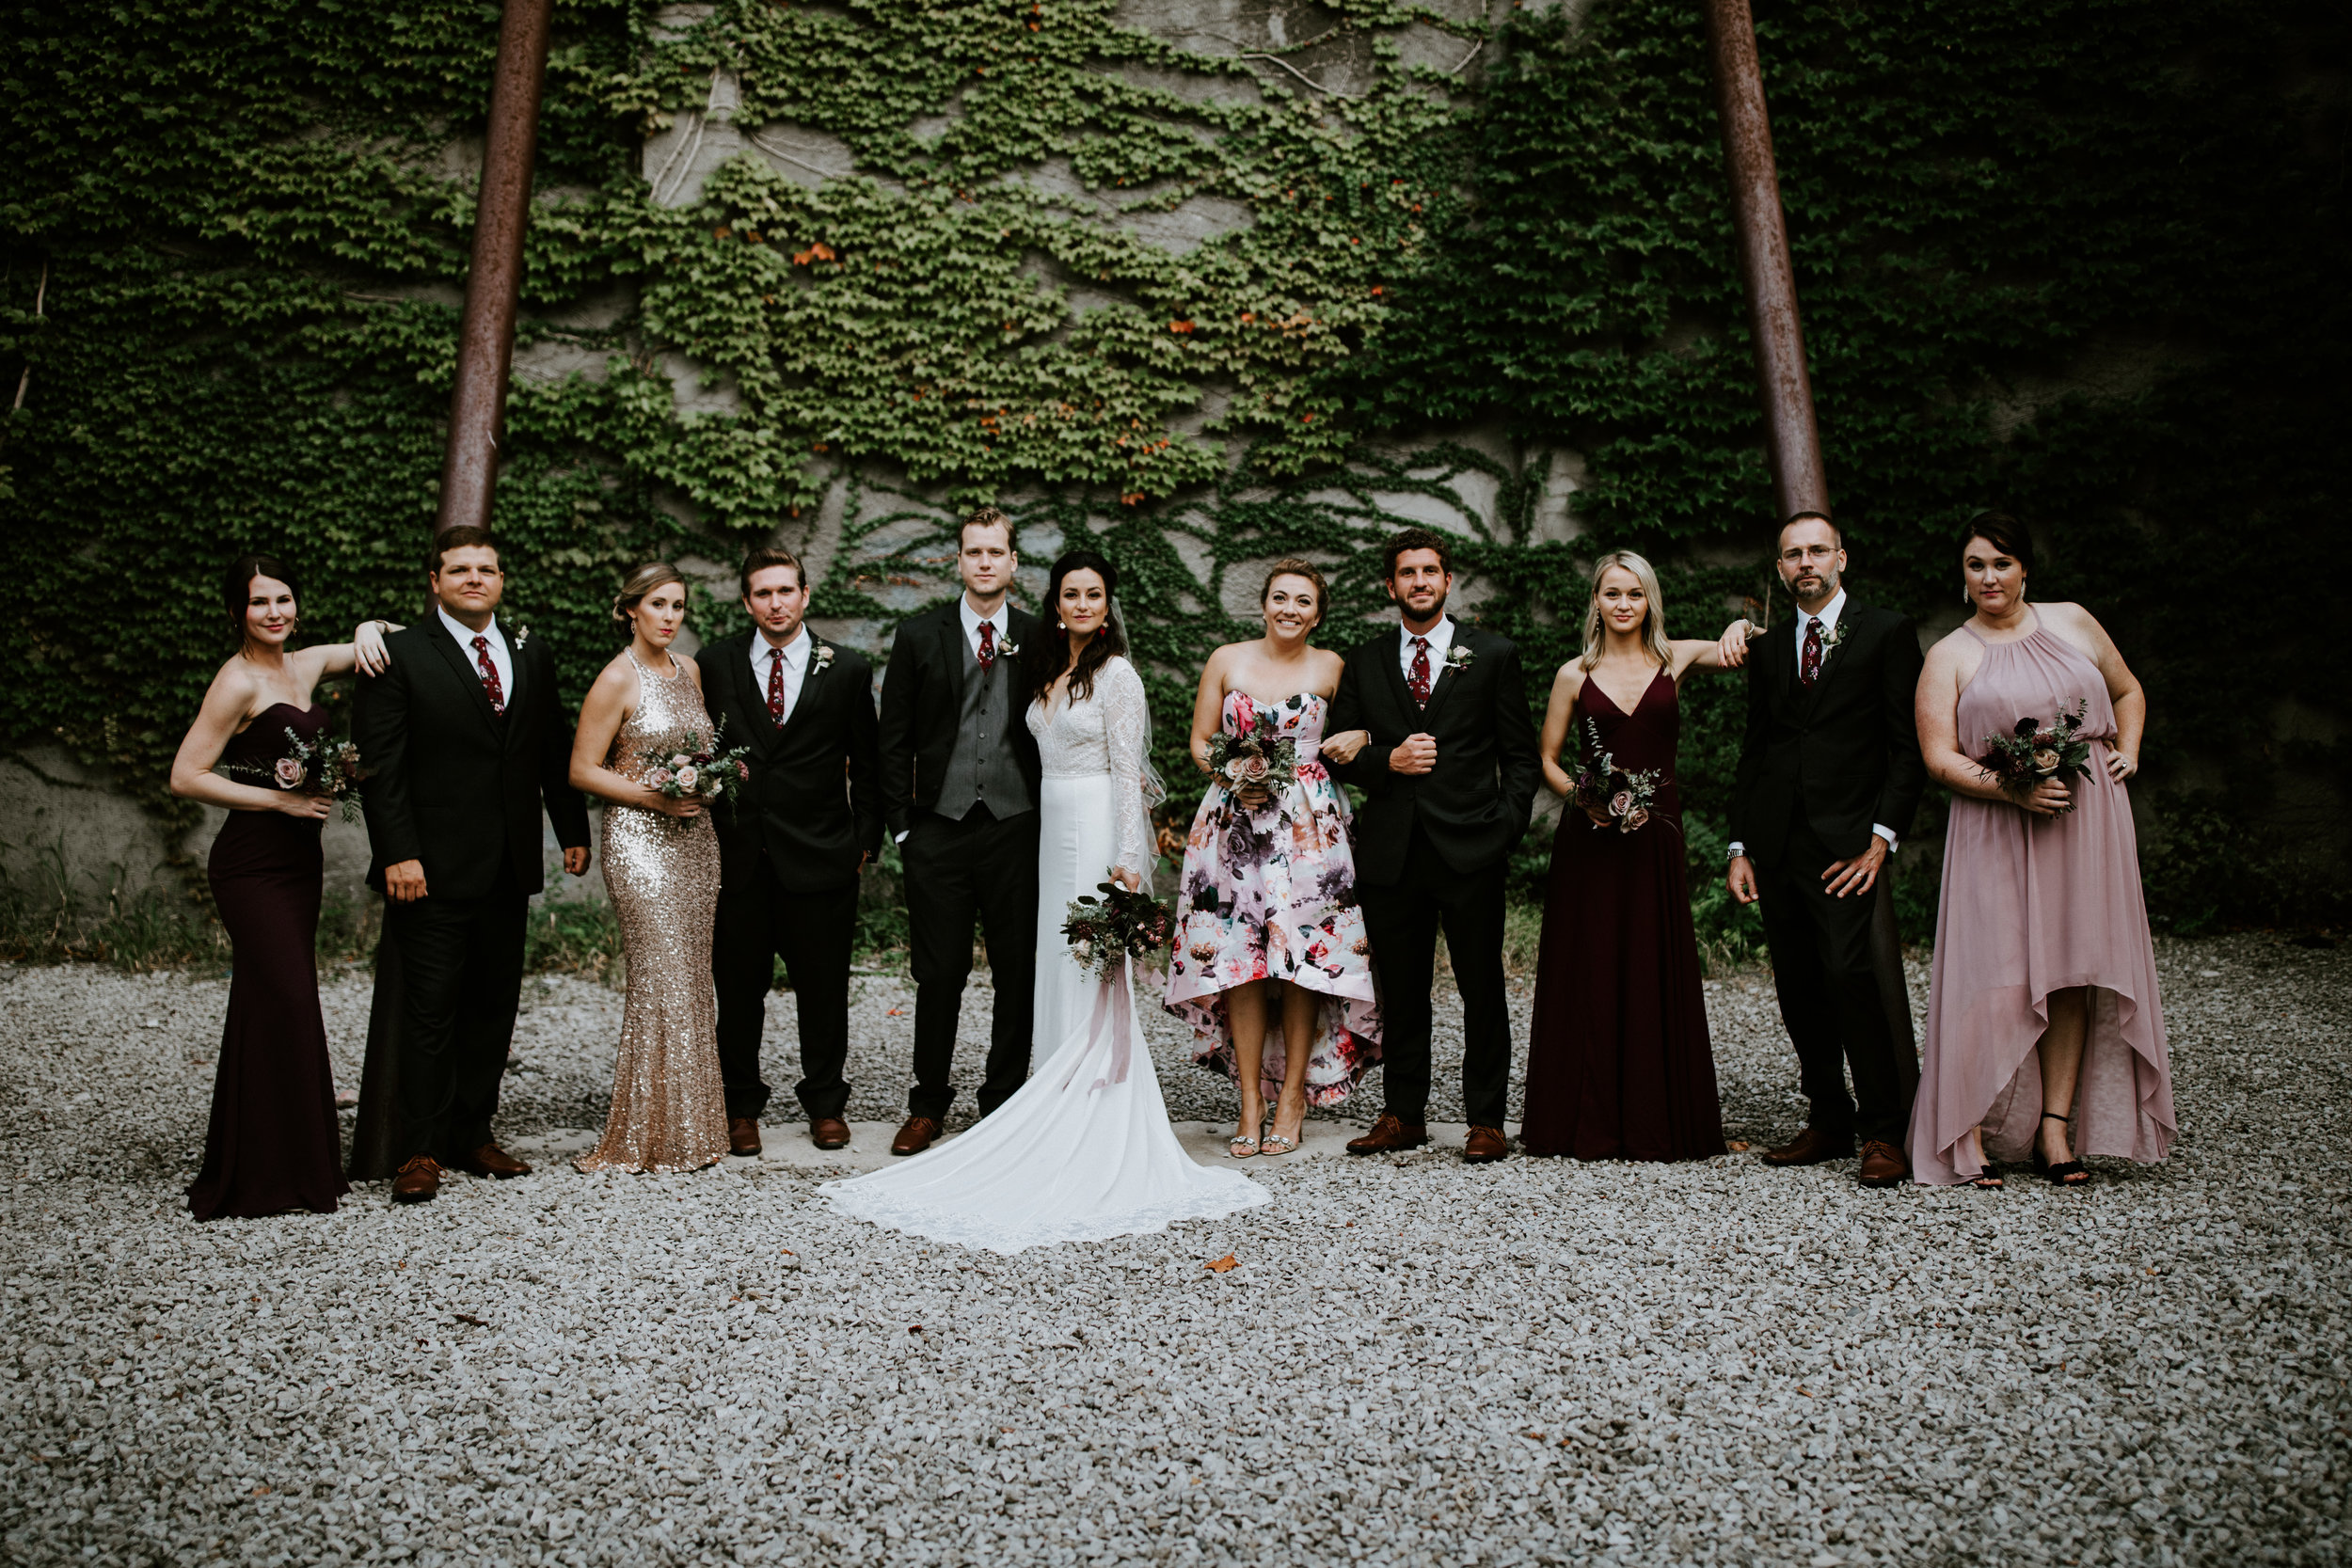 st-louis-missouri-wedding-photographer-tower-grove-park-sheldon-concert-hall-steph+phil-803.jpg